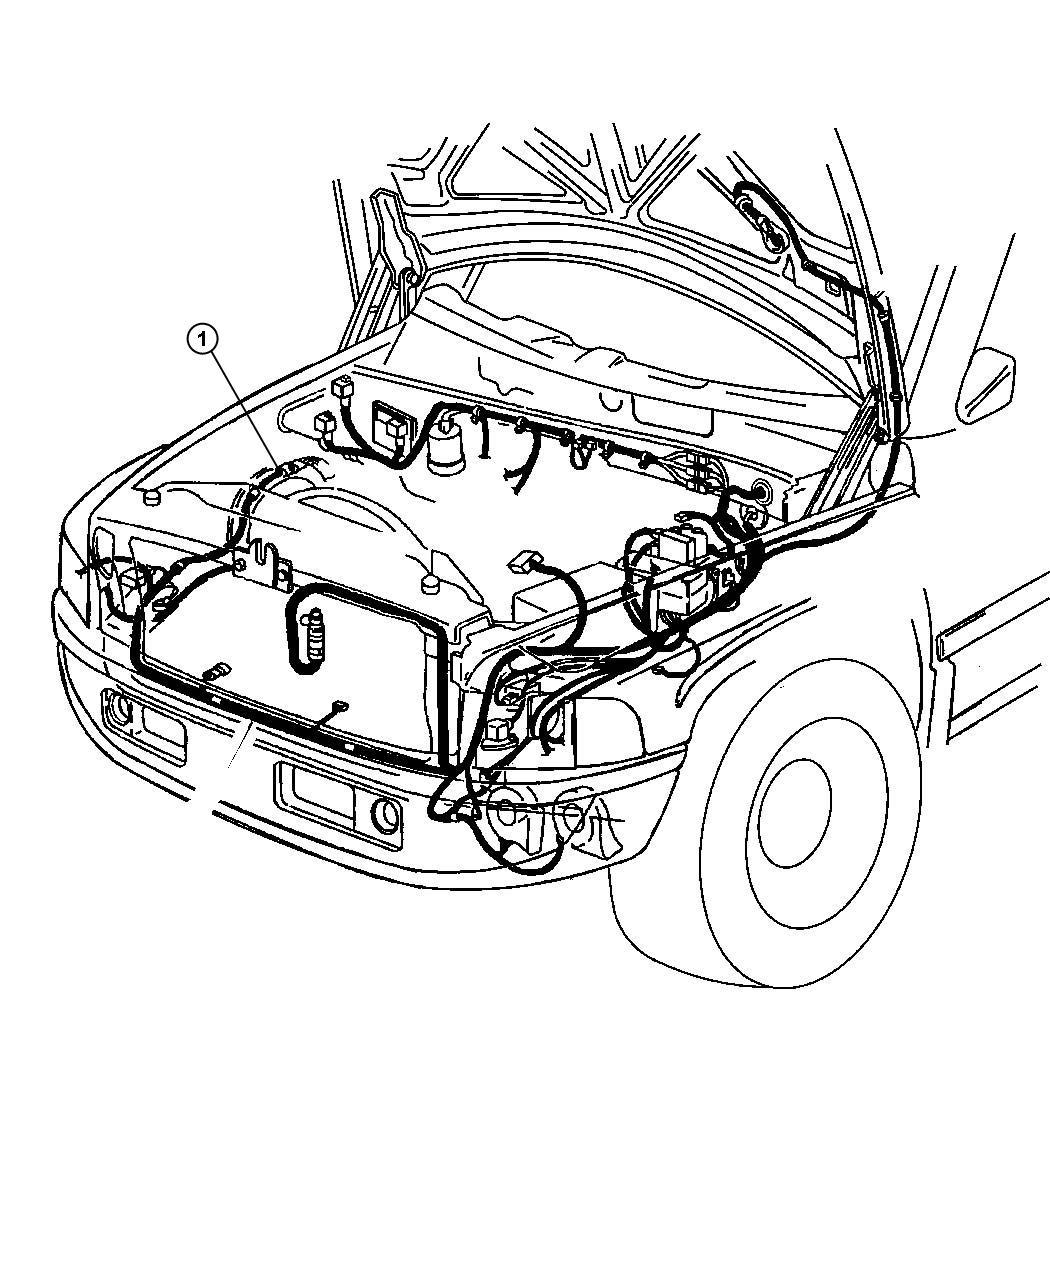 2008 Dodge Ram 4500 Wiring. Headlamp to dash. Brt, lock